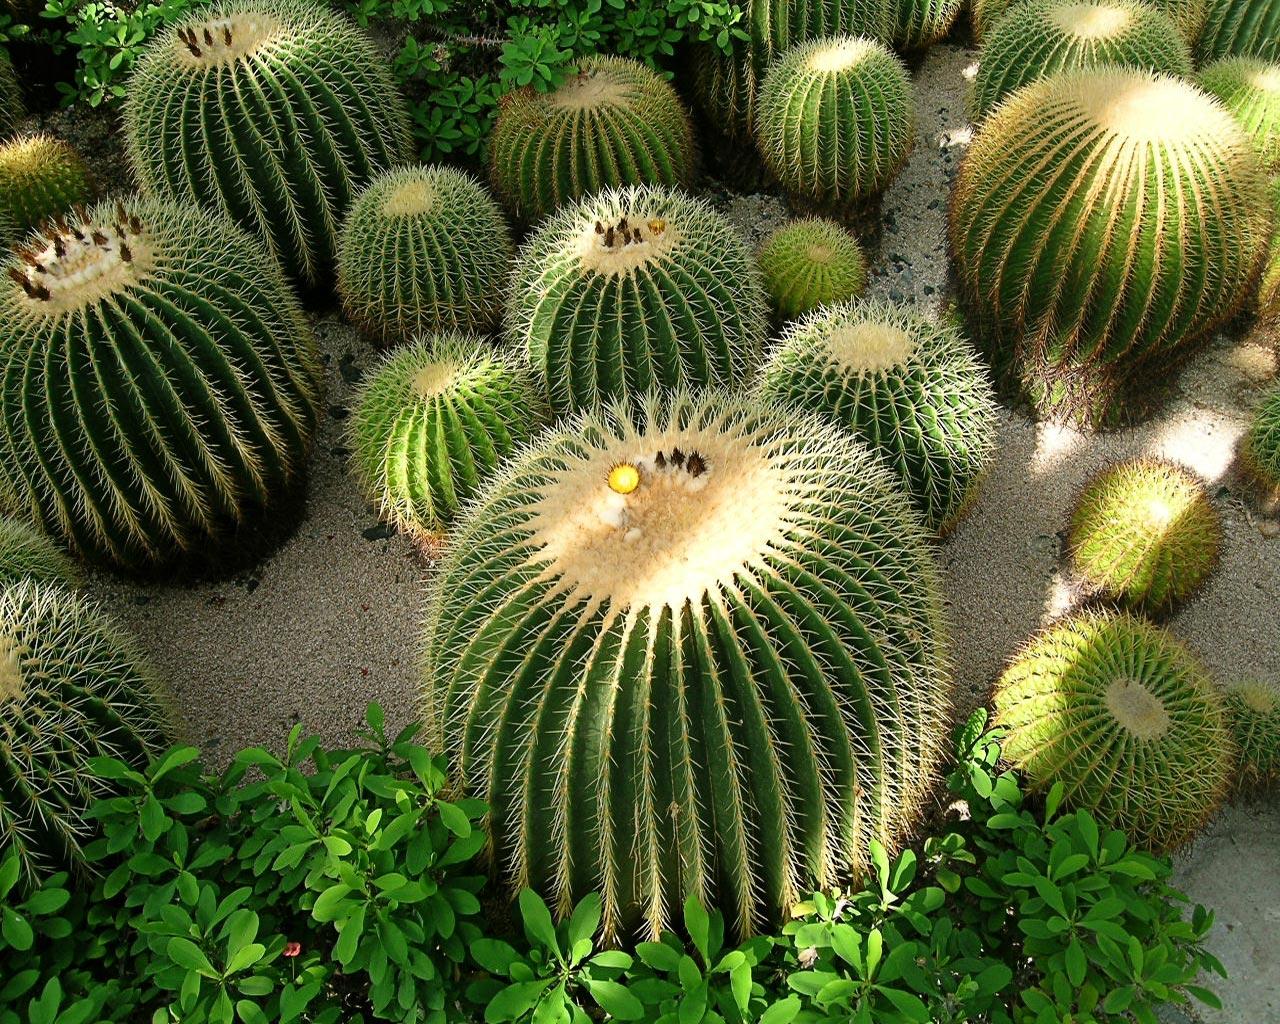 desert wallpaper cactus hd - photo #4